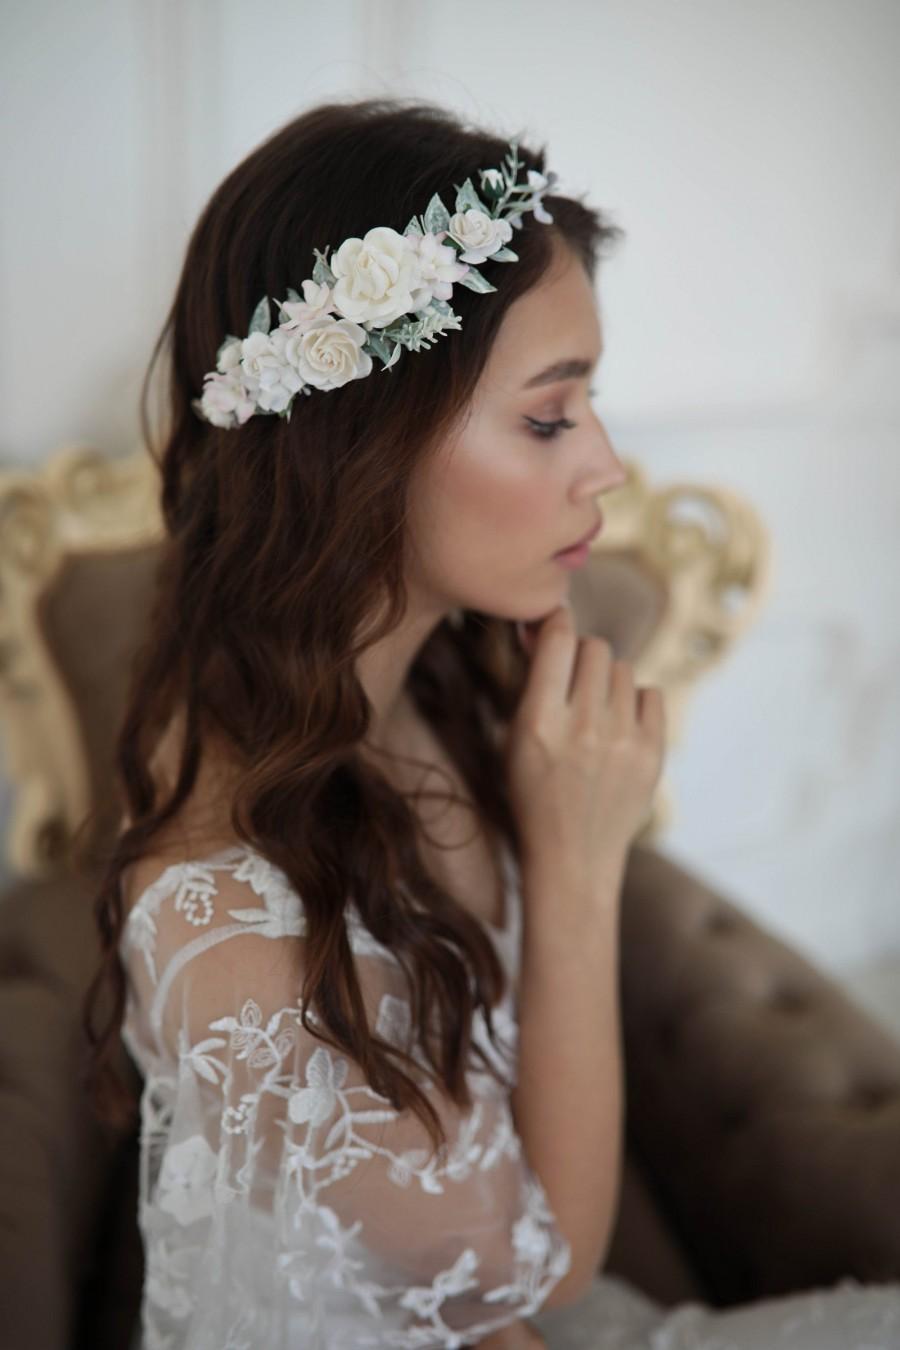 Wedding - White flower crown, Wedding Flower Crown, Side Flower crown, Bohemian crown, Flower Girl Crown, Rose Flower Headband, Bridal Headpiece